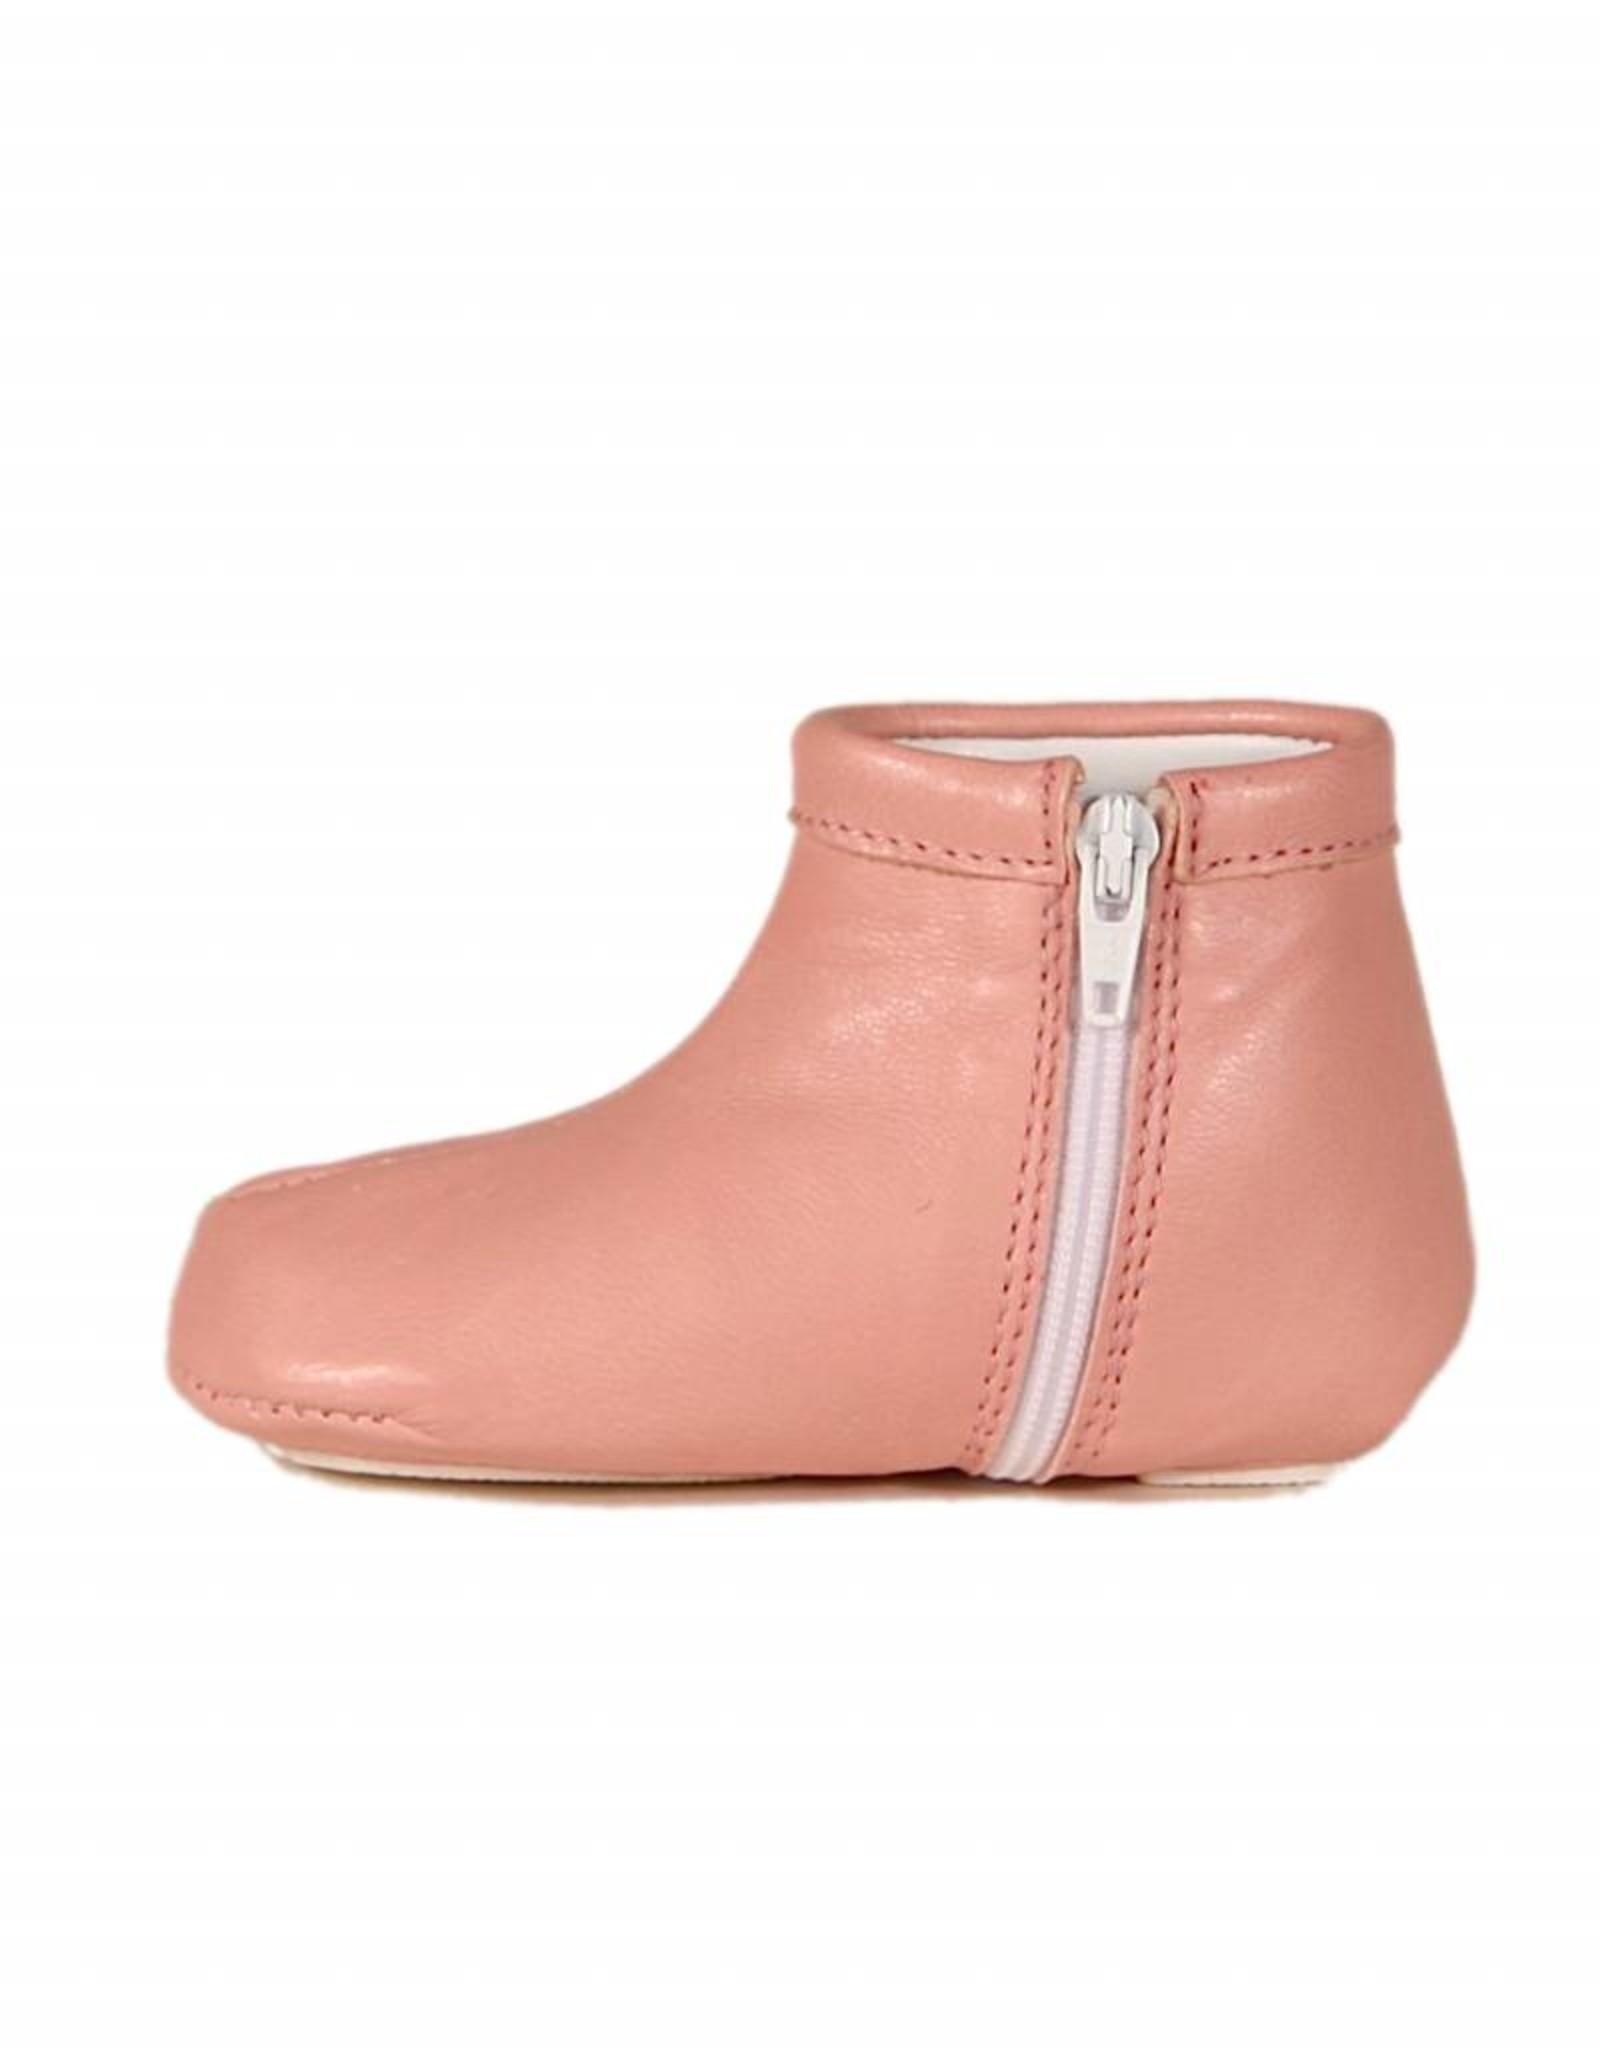 stabifoot 1115 pink